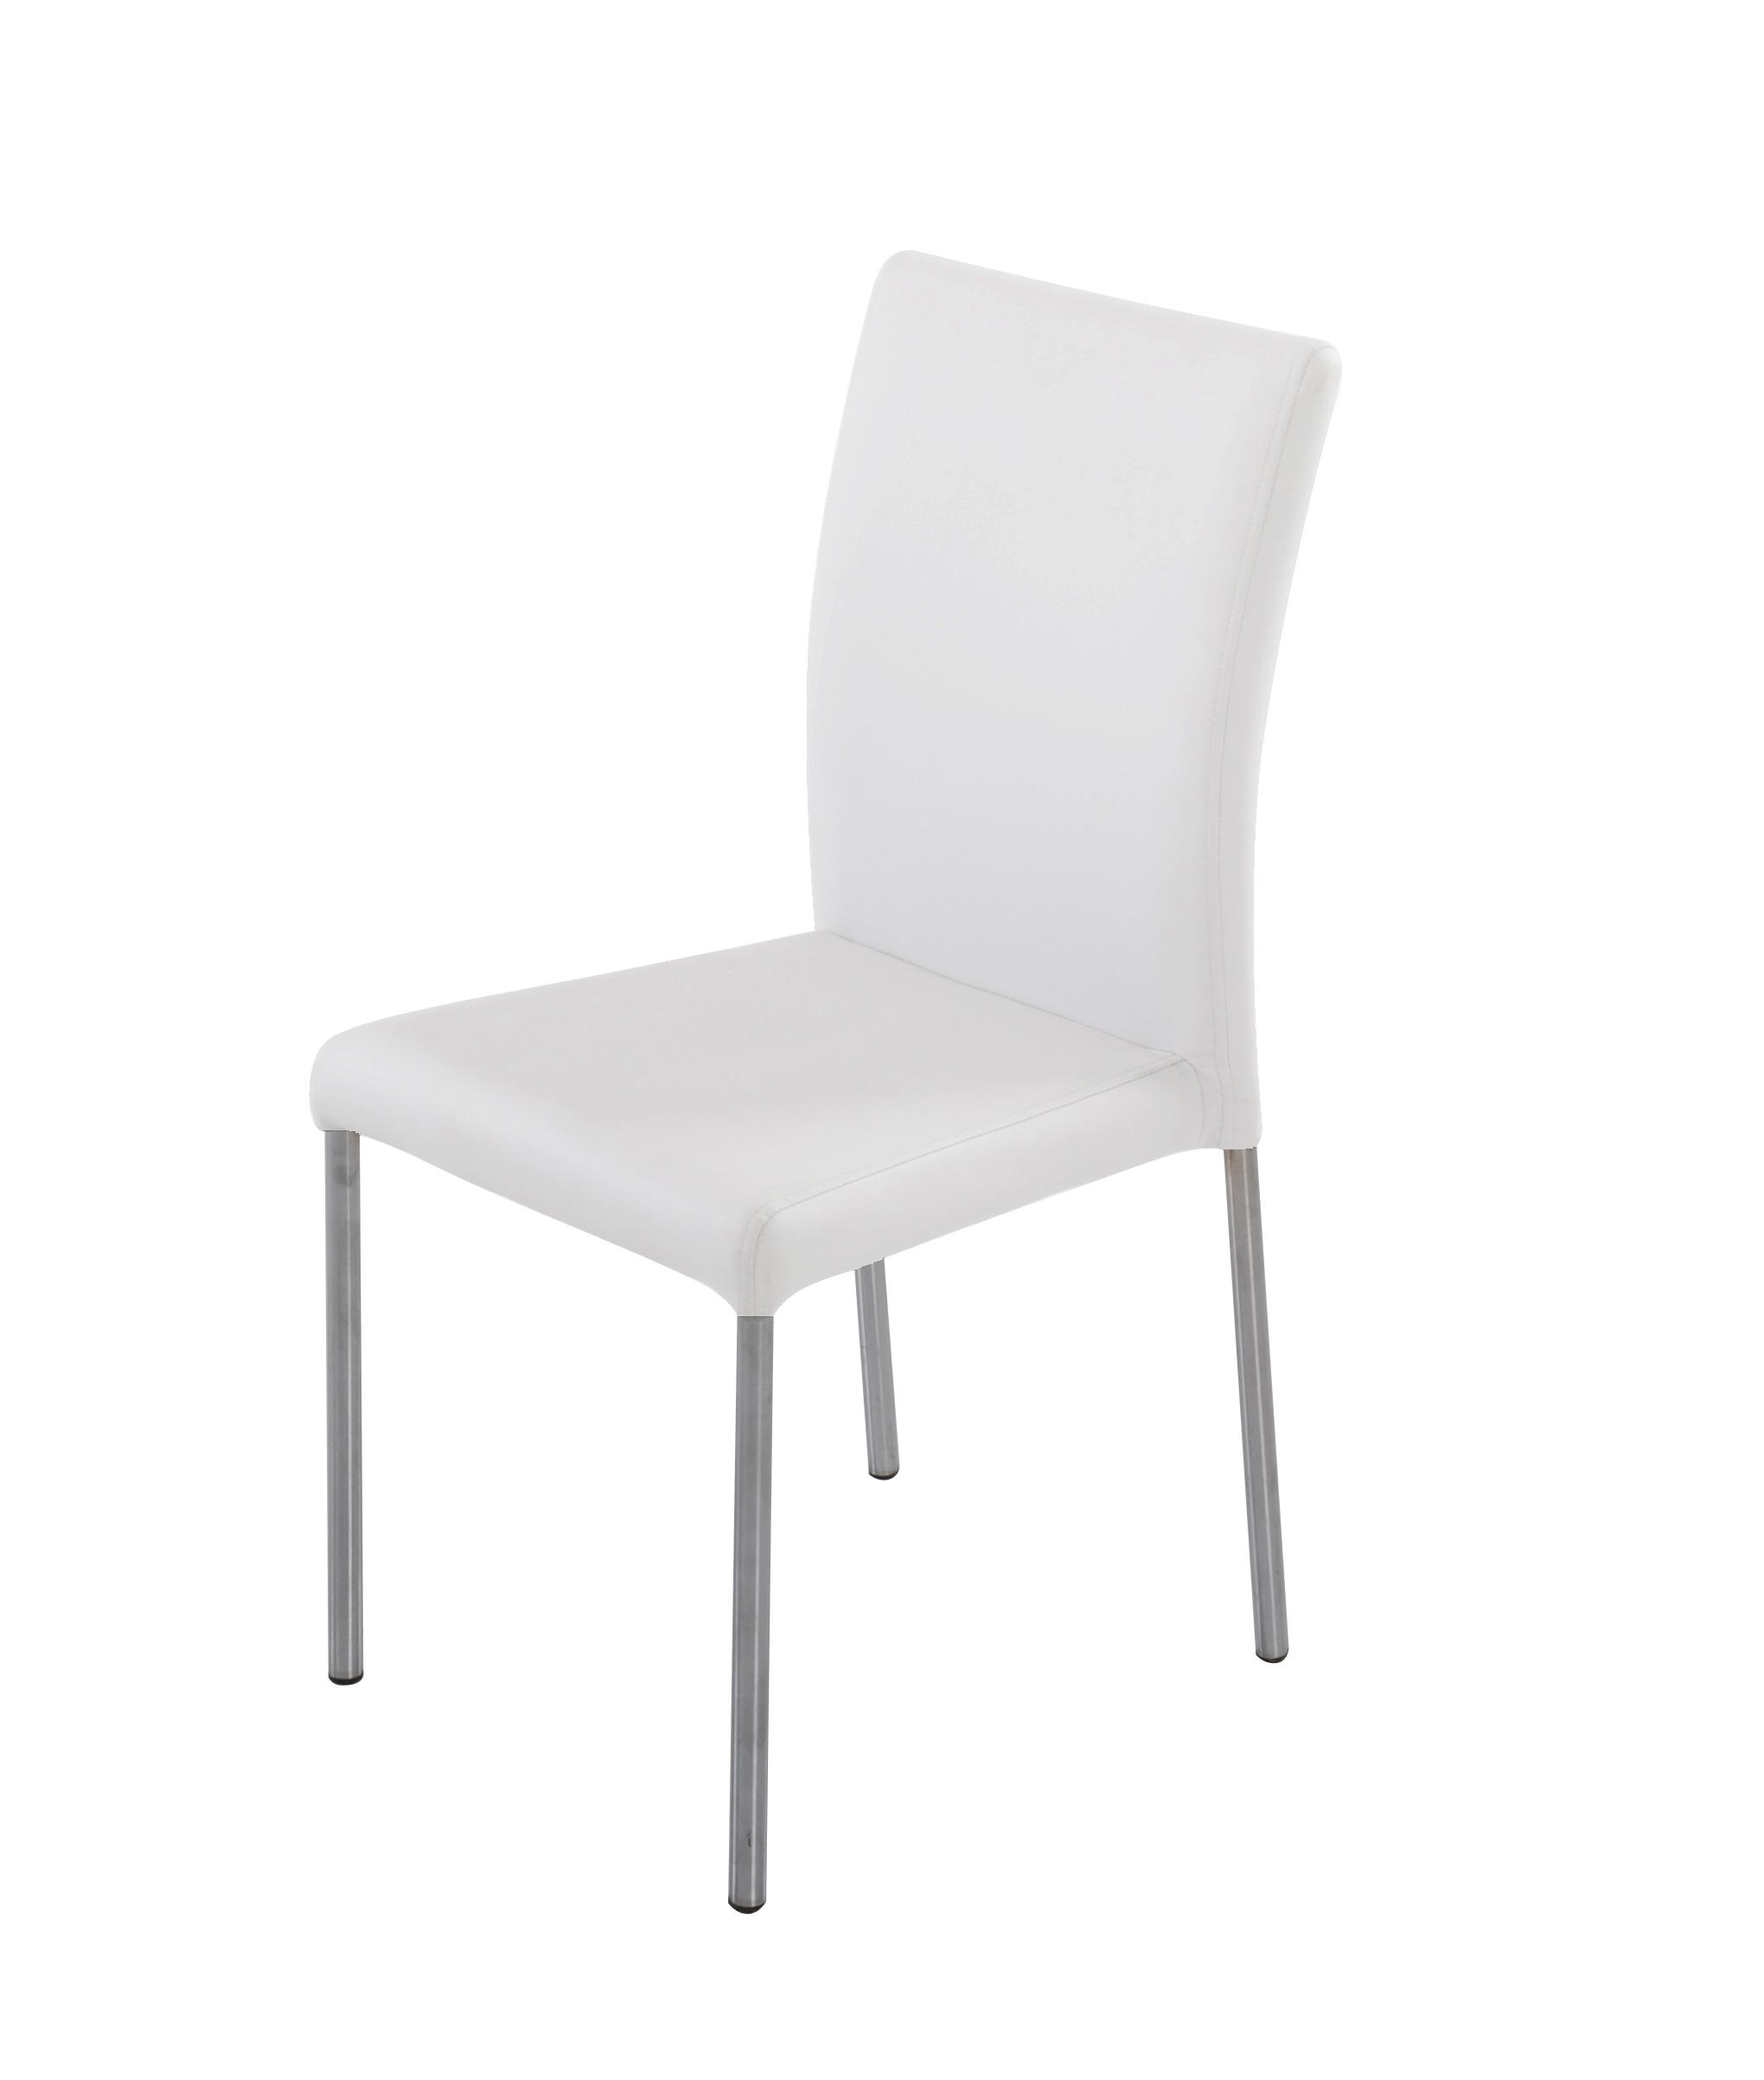 sillas de cocina conforama